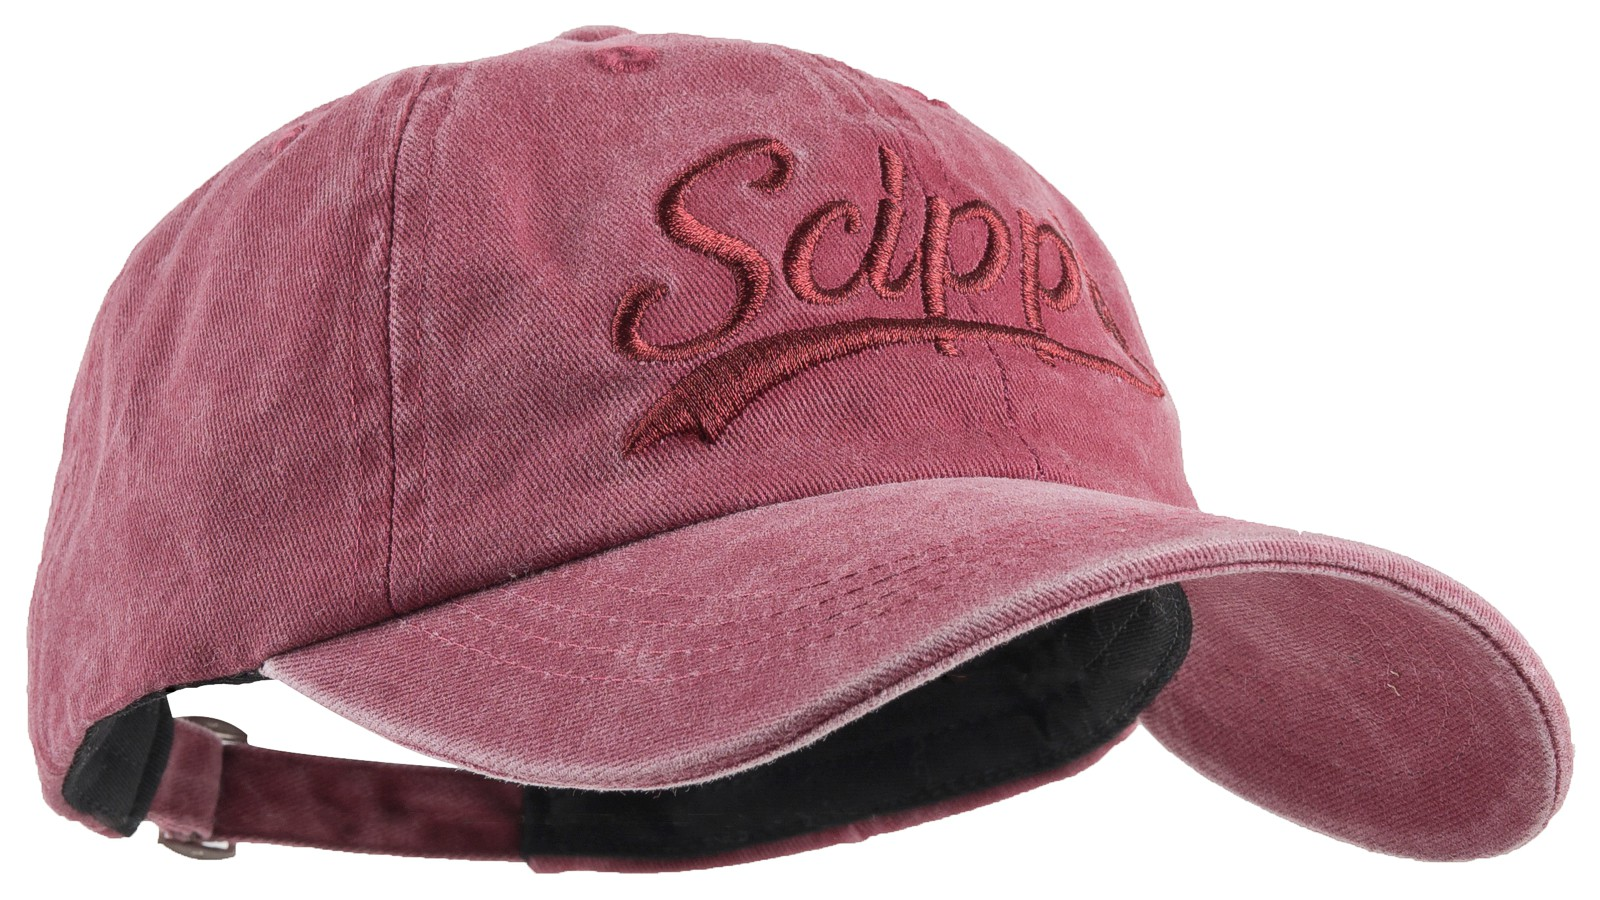 Scippis Baseball-Cap »Scippis Schriftzug« Burgund